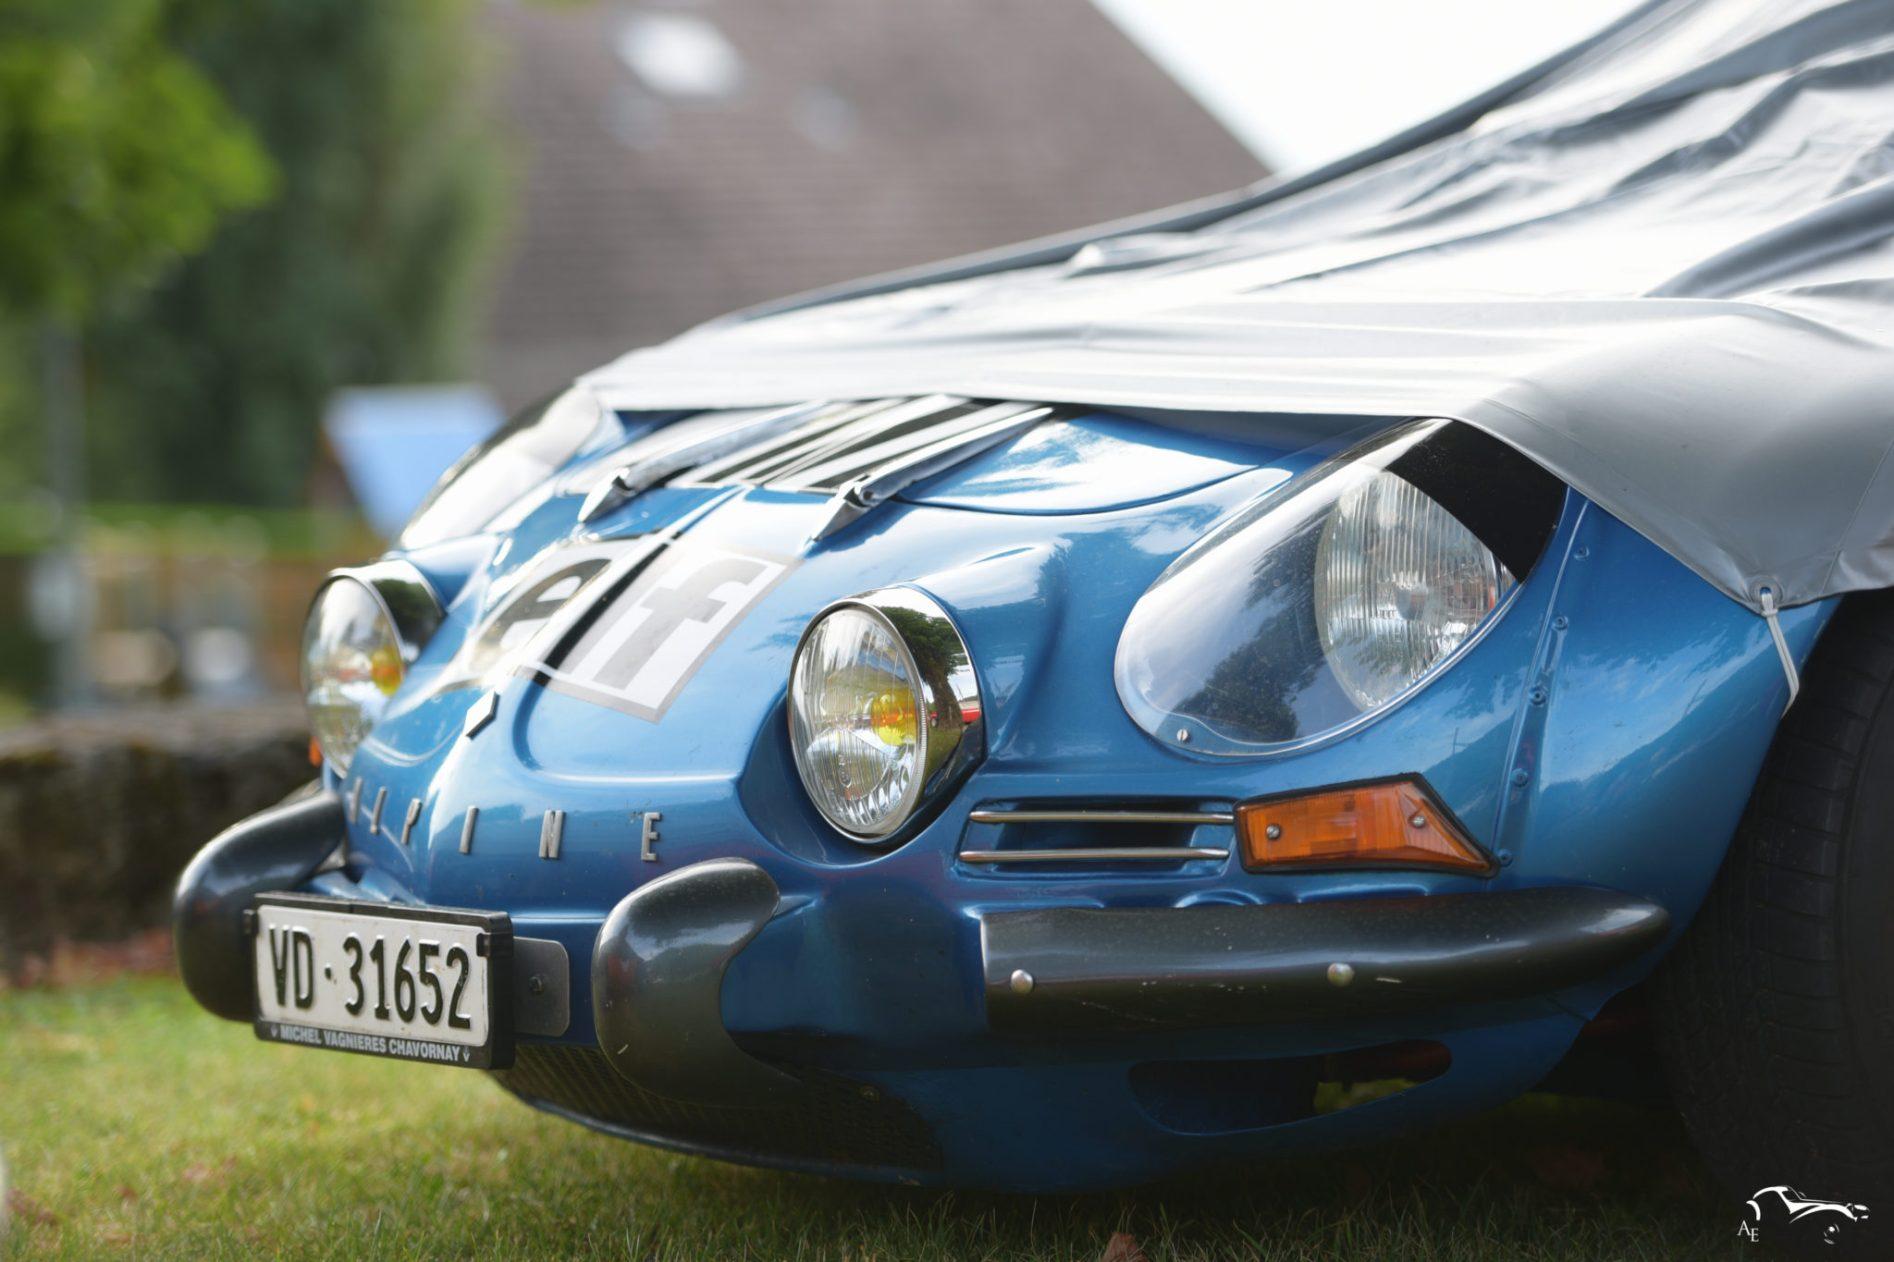 Alpine A110 1296 cc 1970